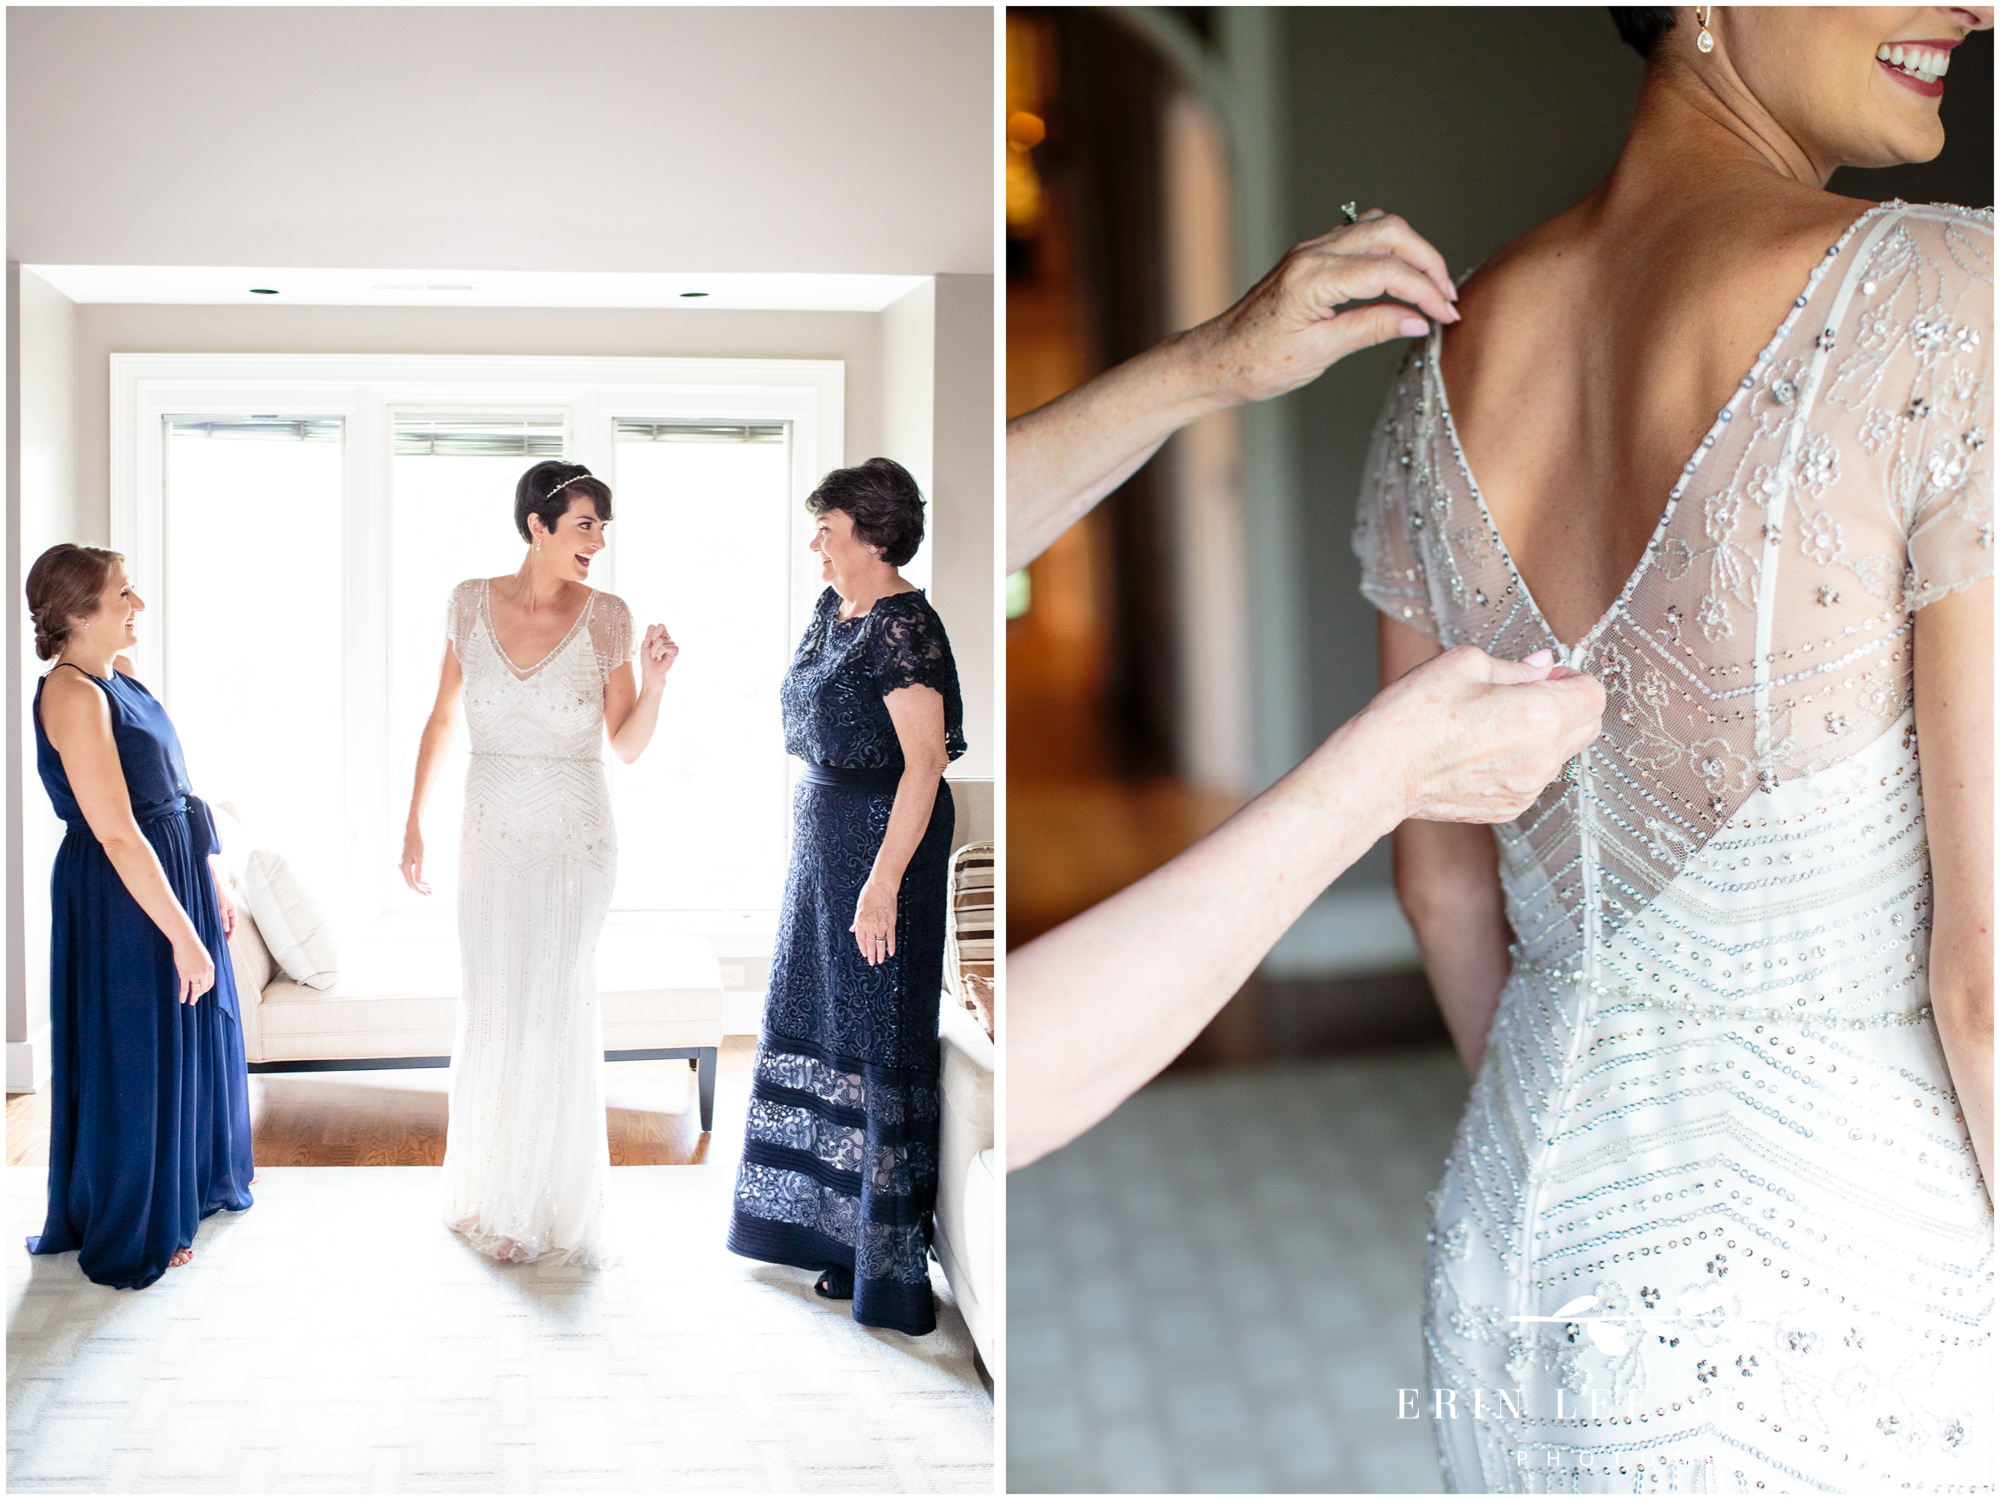 Getting_Into_Wedding_Dress